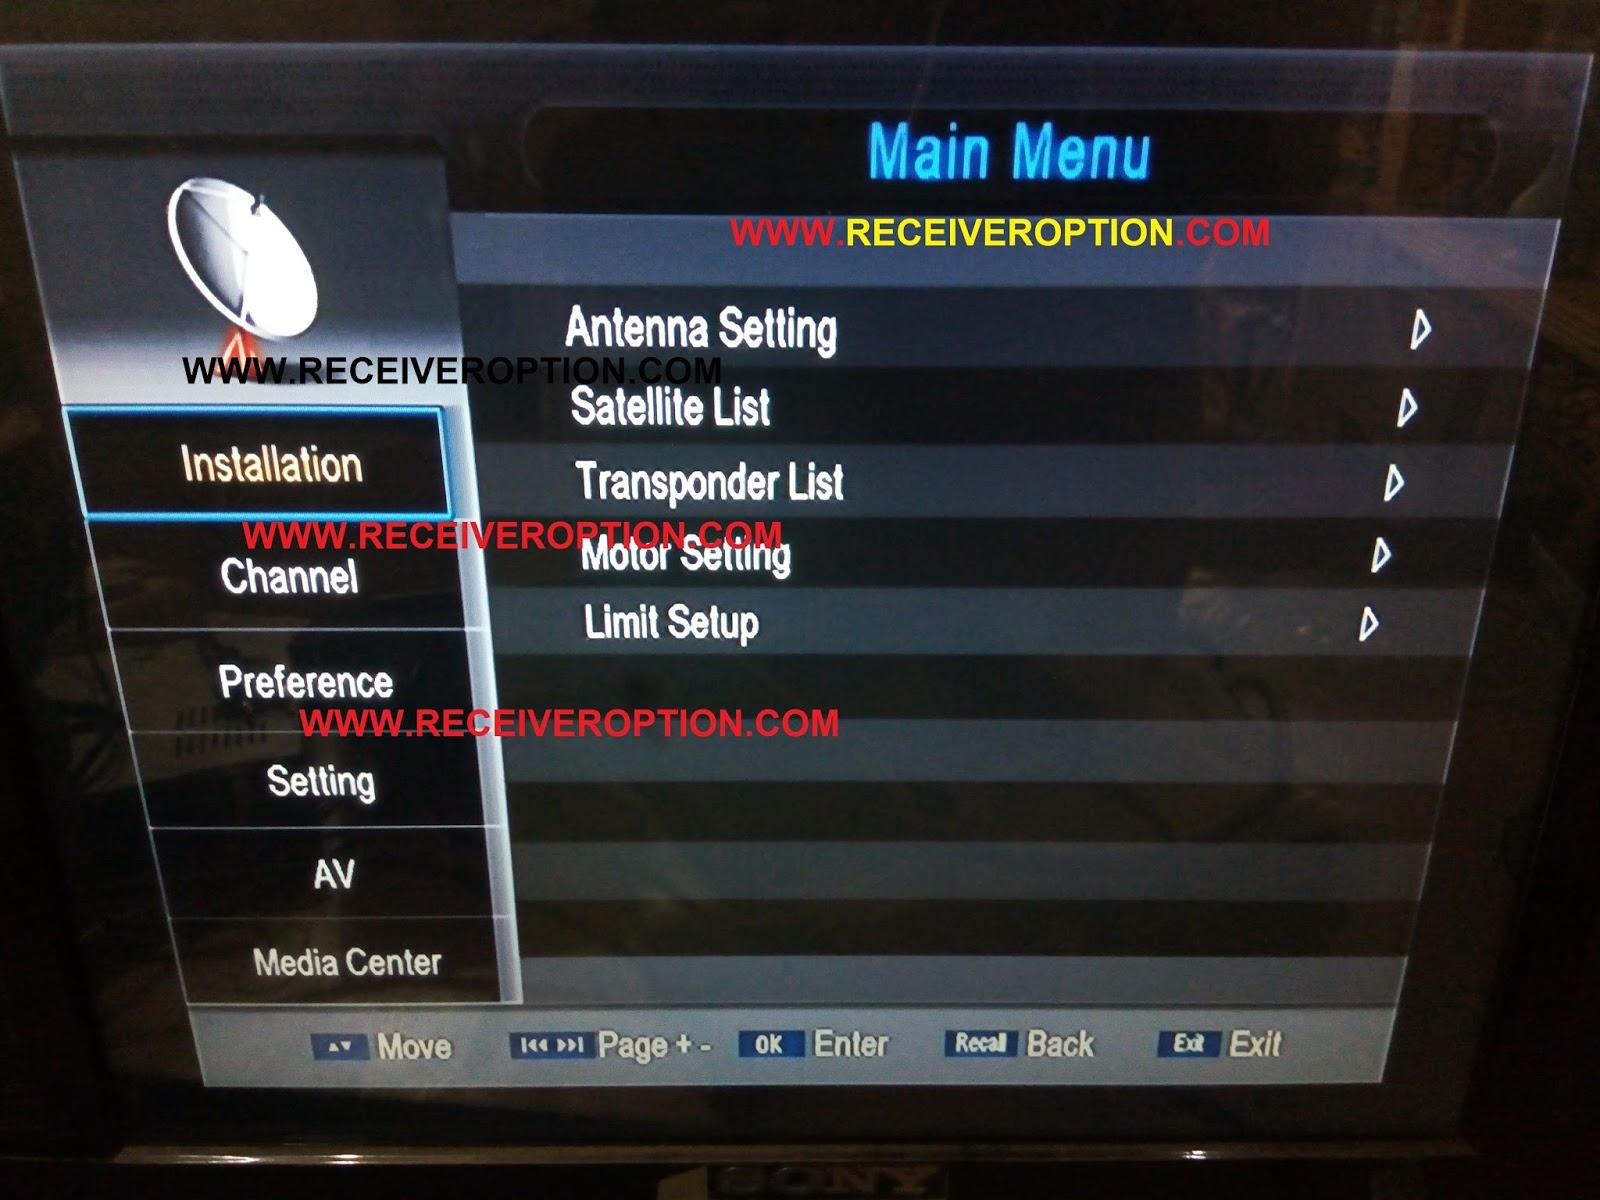 ECHOLINK 2017 HD RECEIVER POWERVU KEY OPTION - HOW TO ENTER